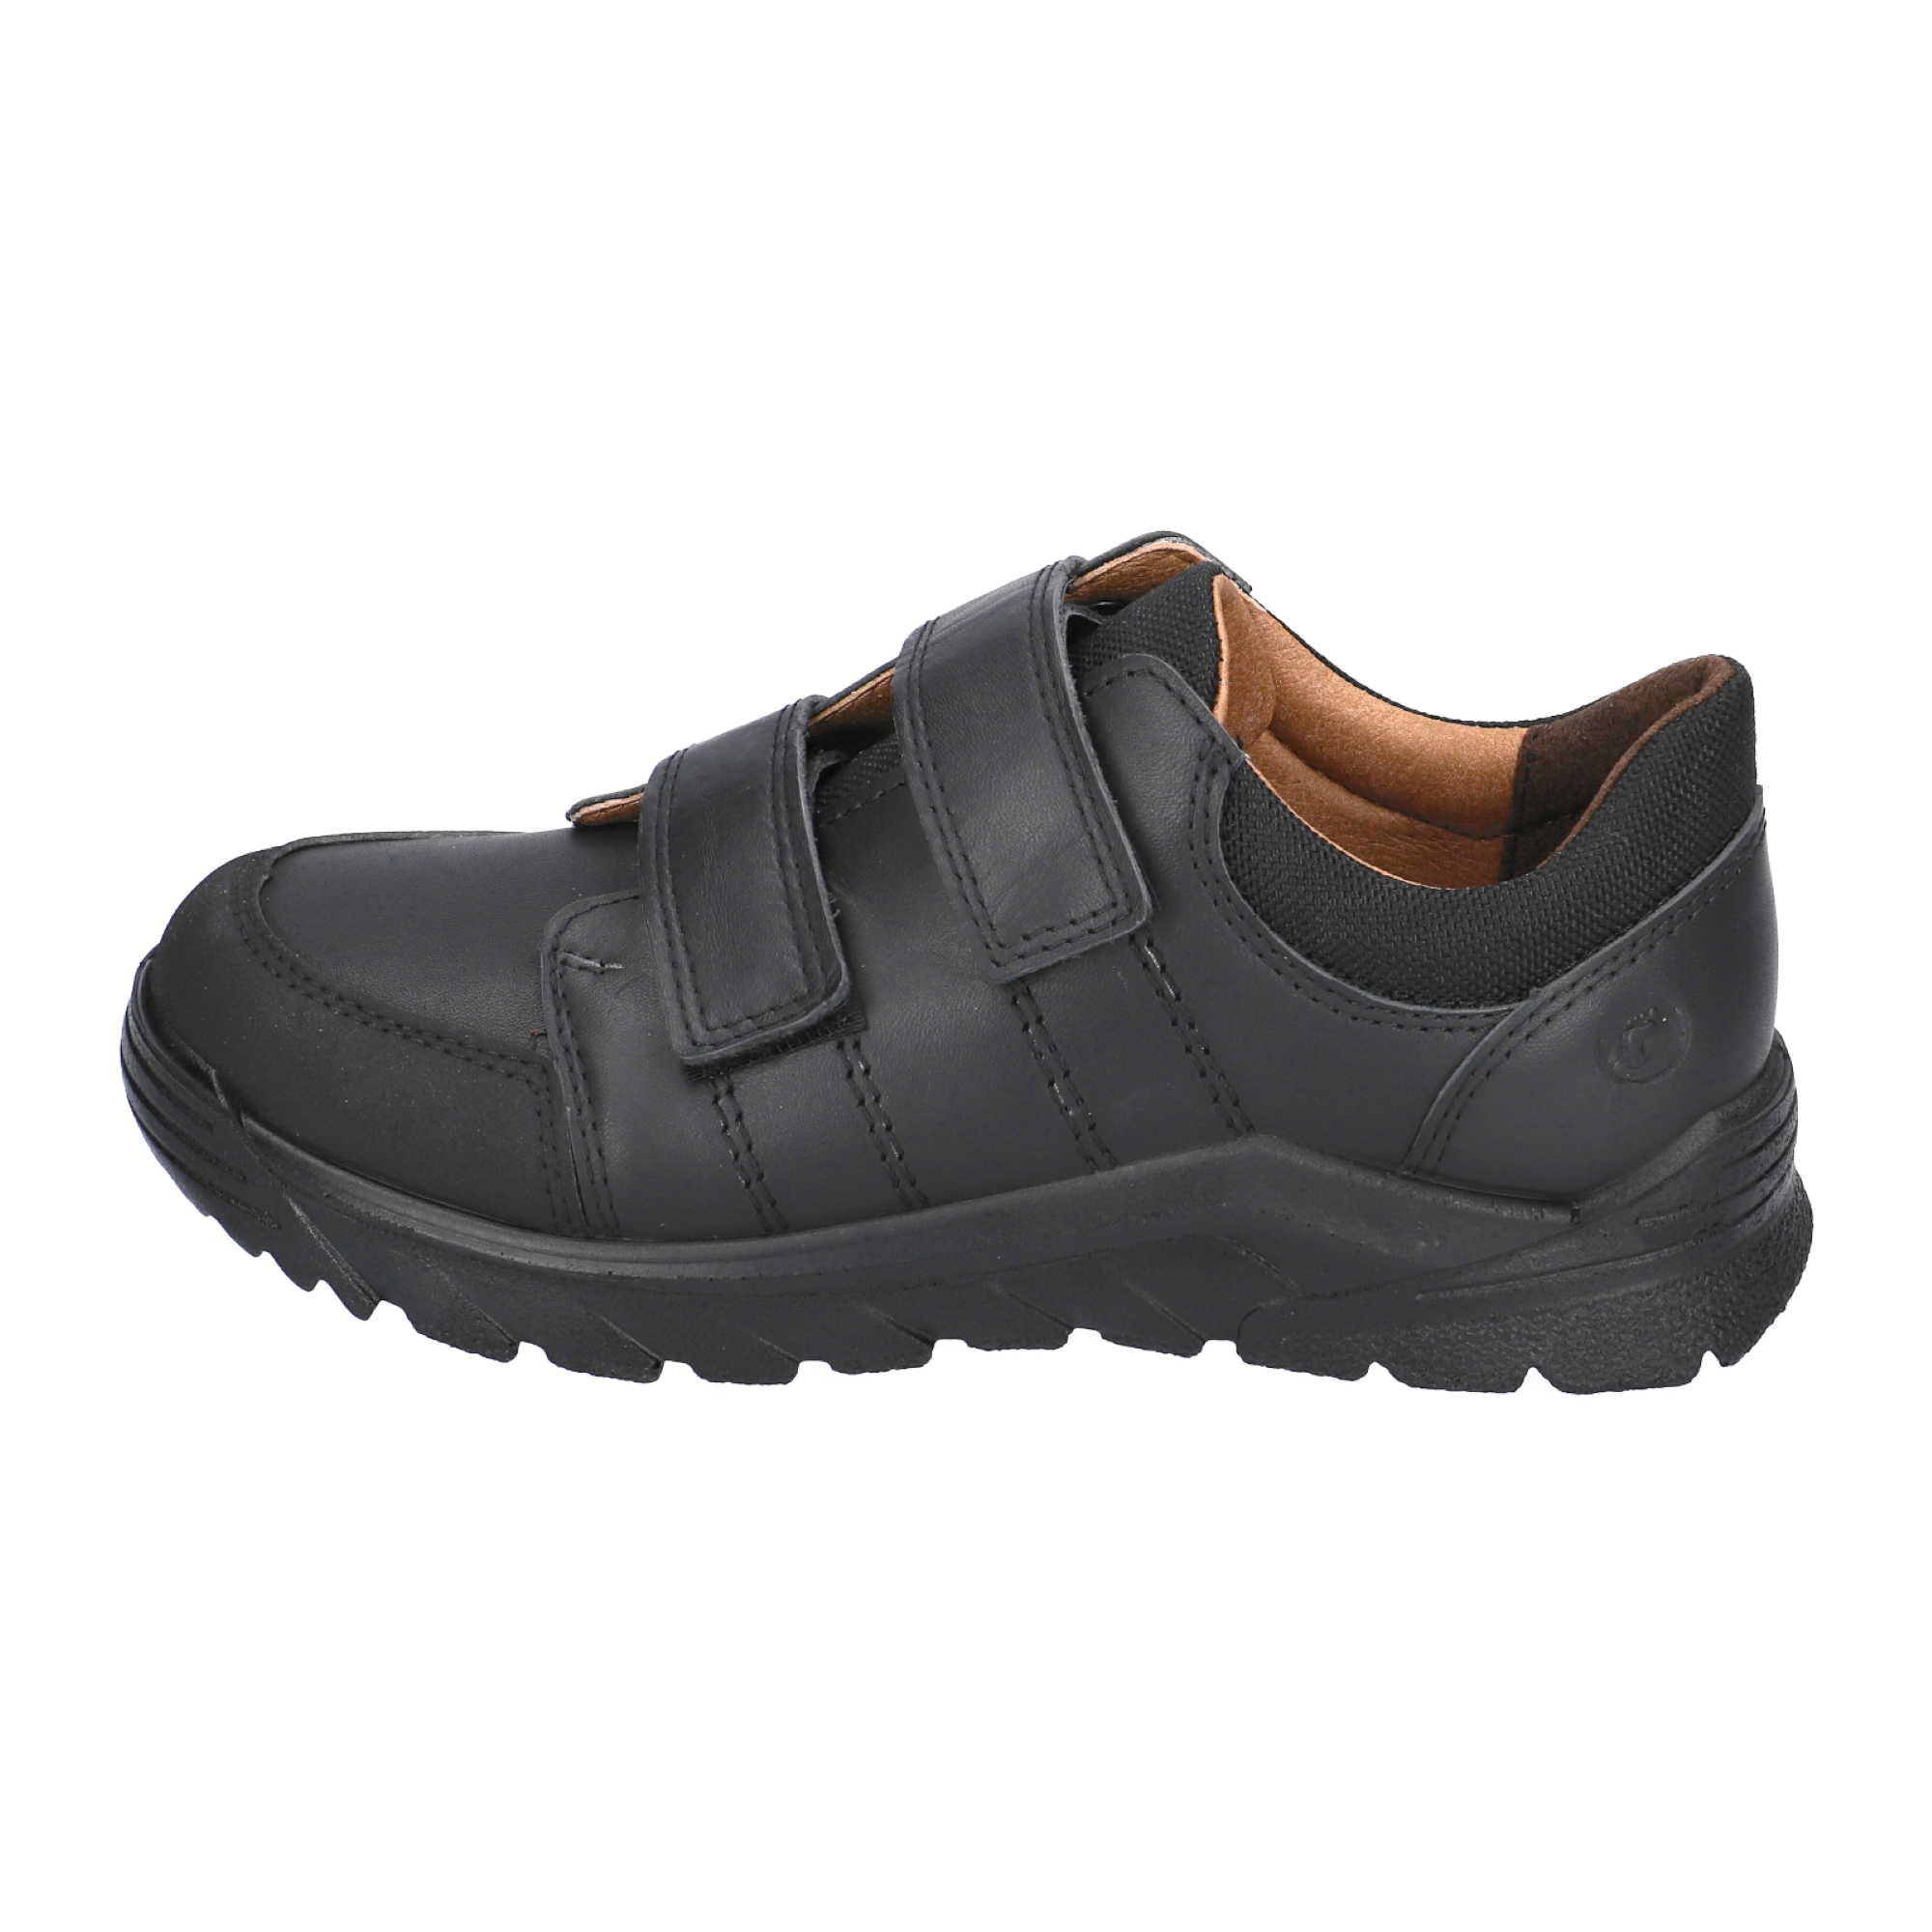 Ricosta Johno Boys School Shoe - The